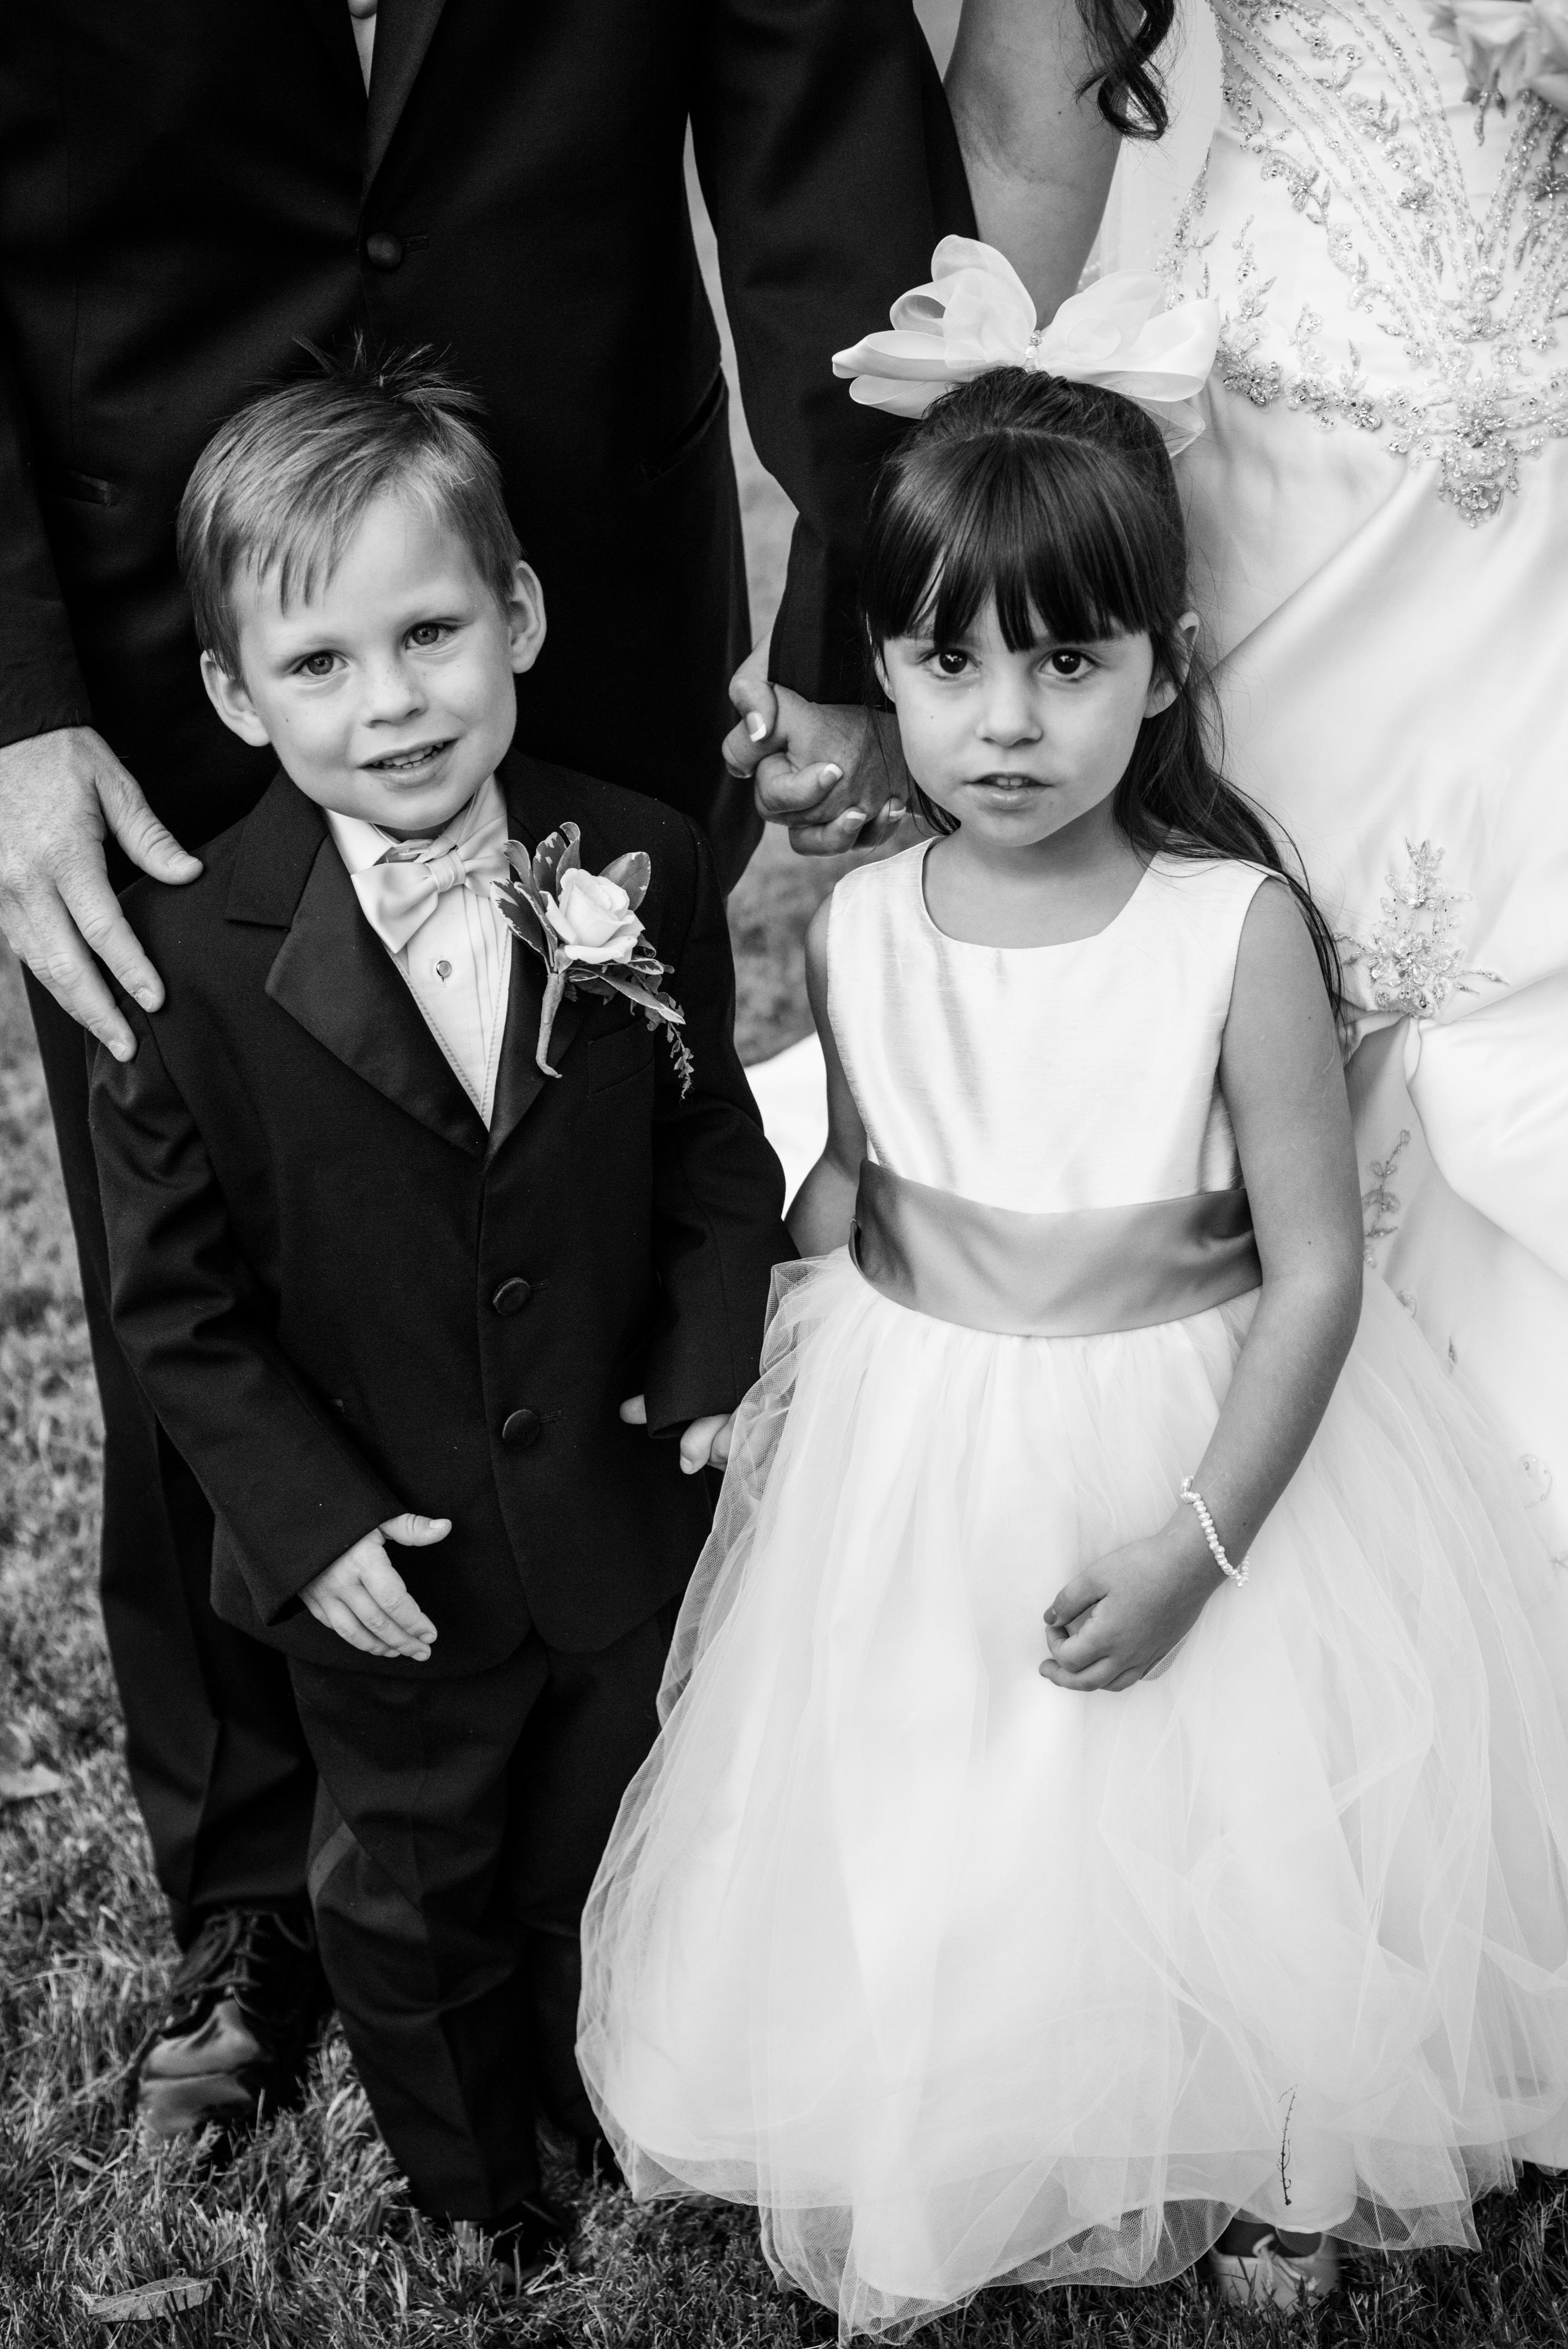 Matt-Blakely-wedding-nashville-tn-legacy-farms-1024